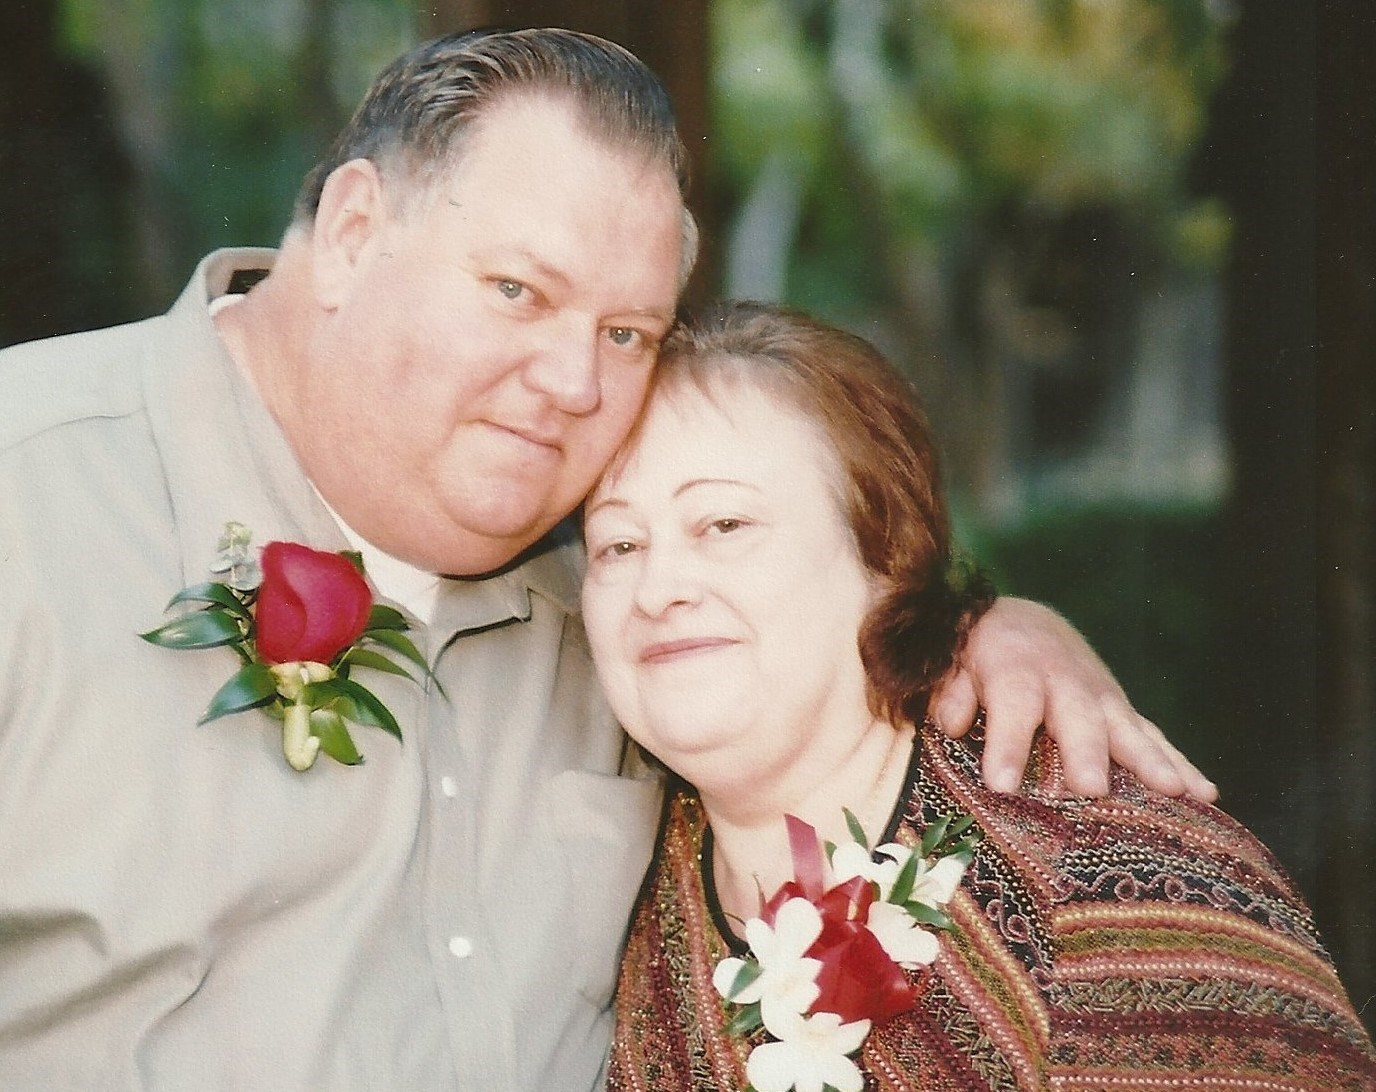 Allisoninlove barbara allison obituary - houston, tx